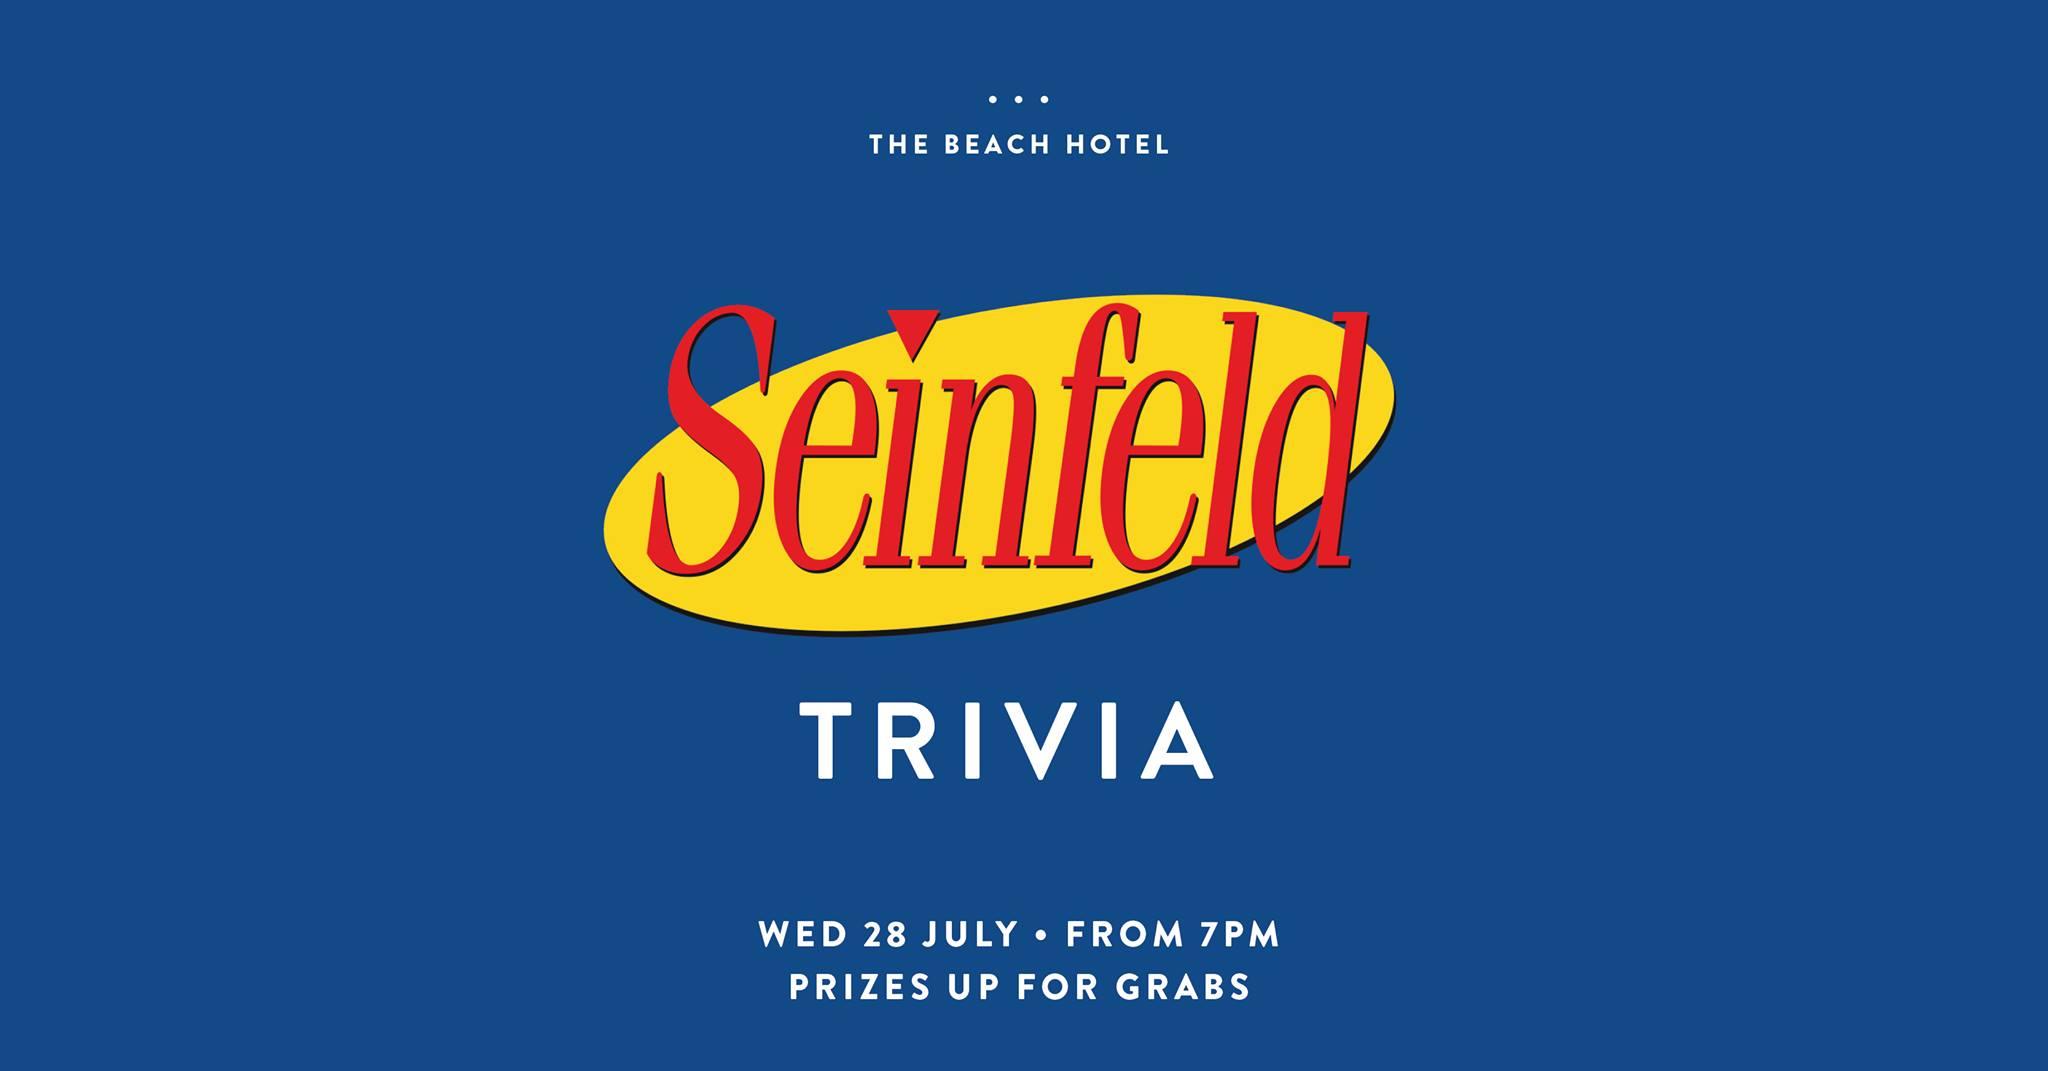 Seinfeld Trivia at The Beaches